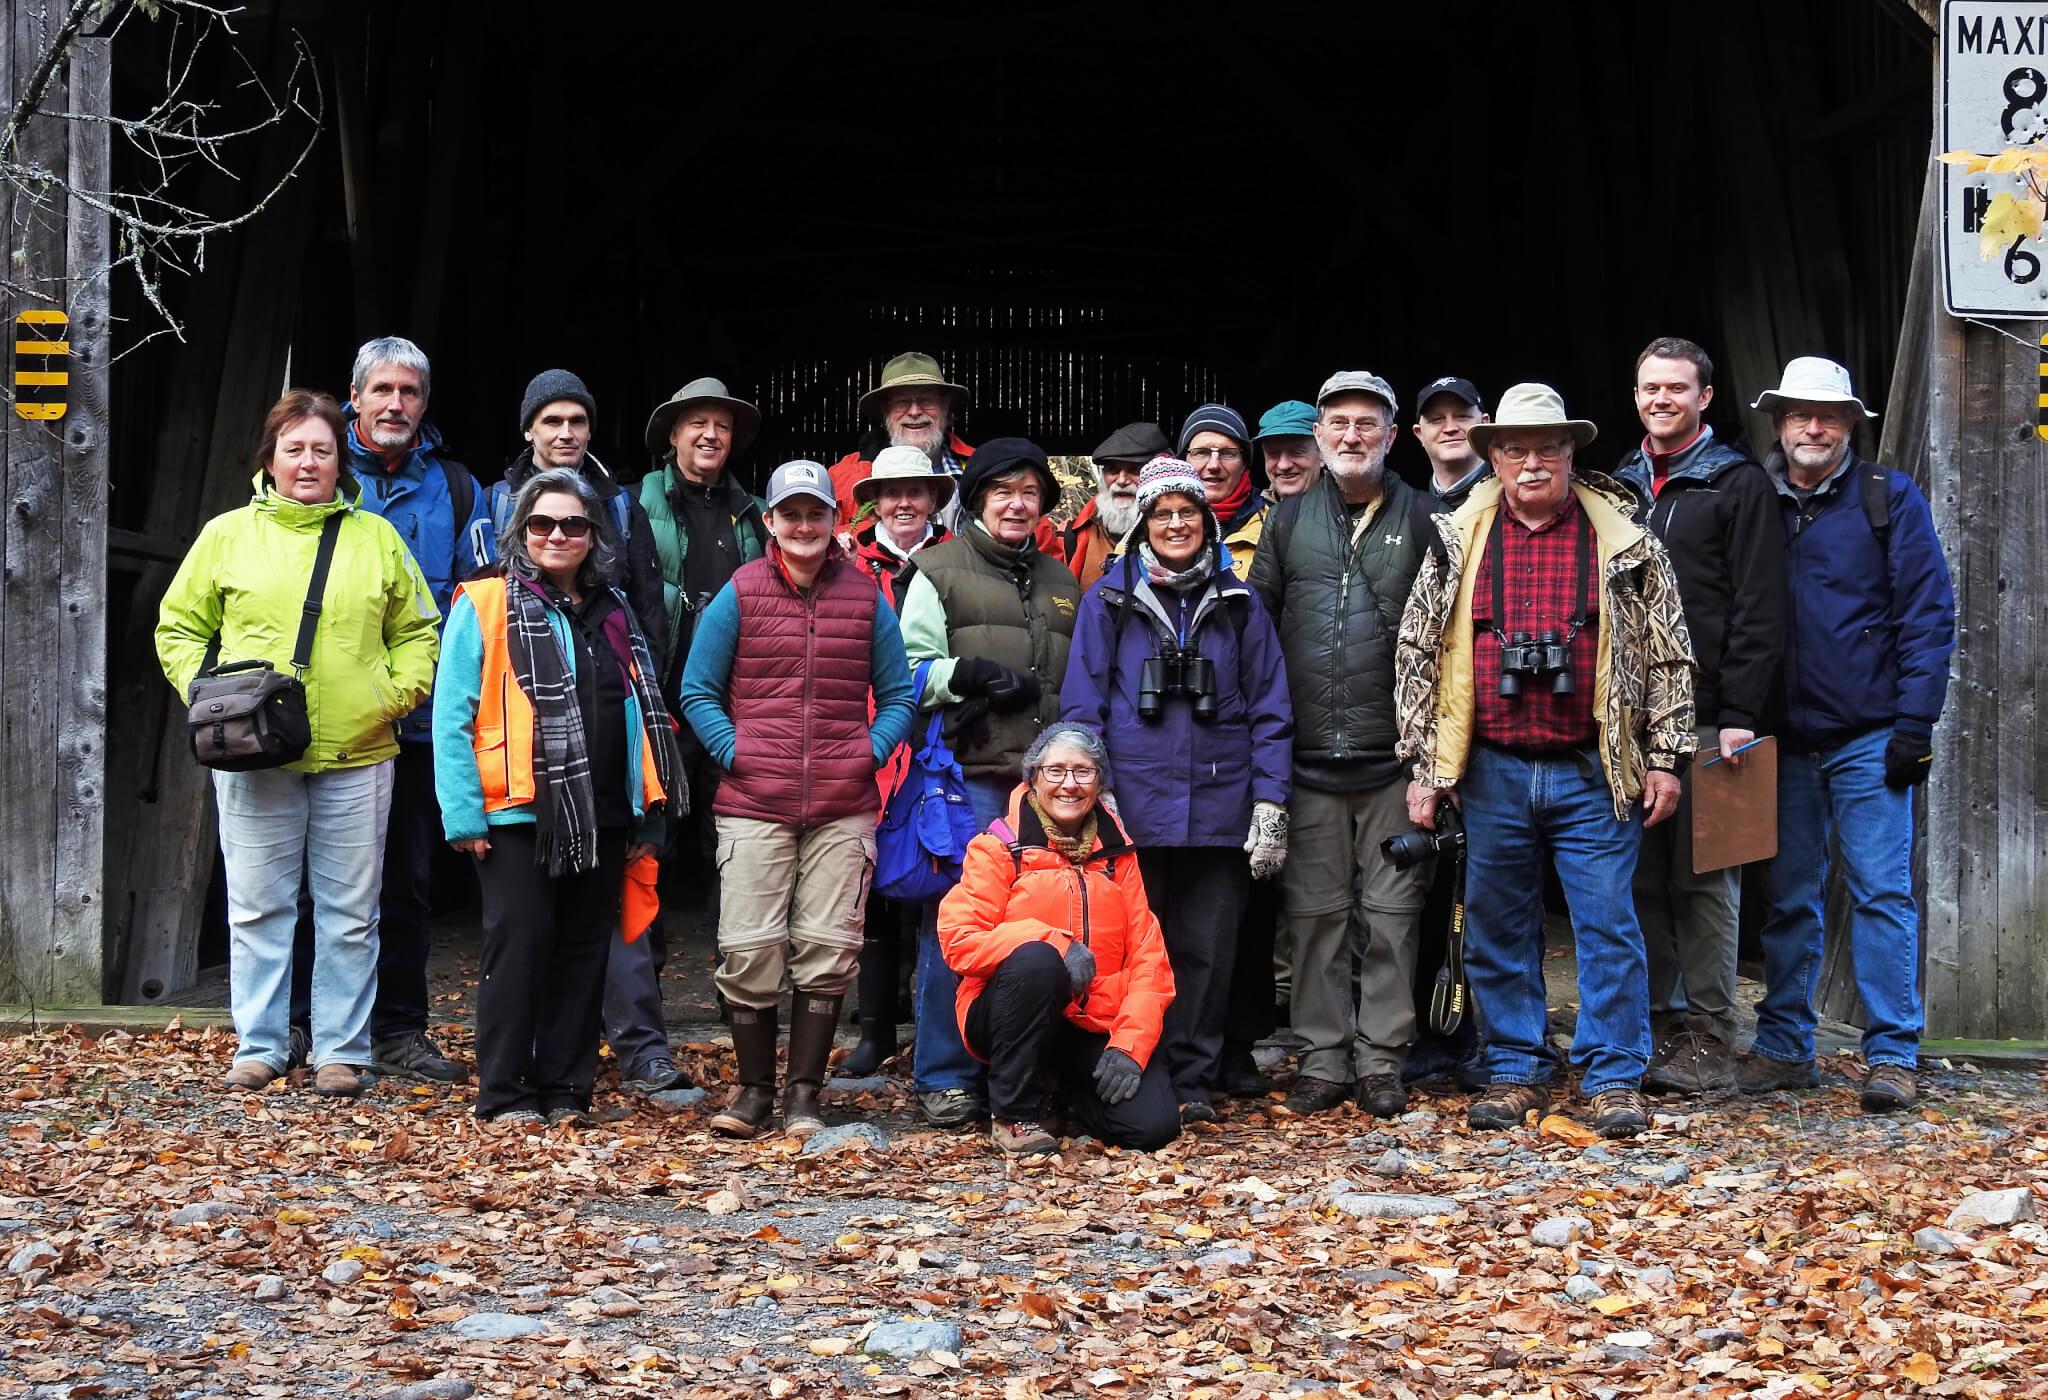 Caledonia Gorge PNA Field Trip Group by Brian Stone